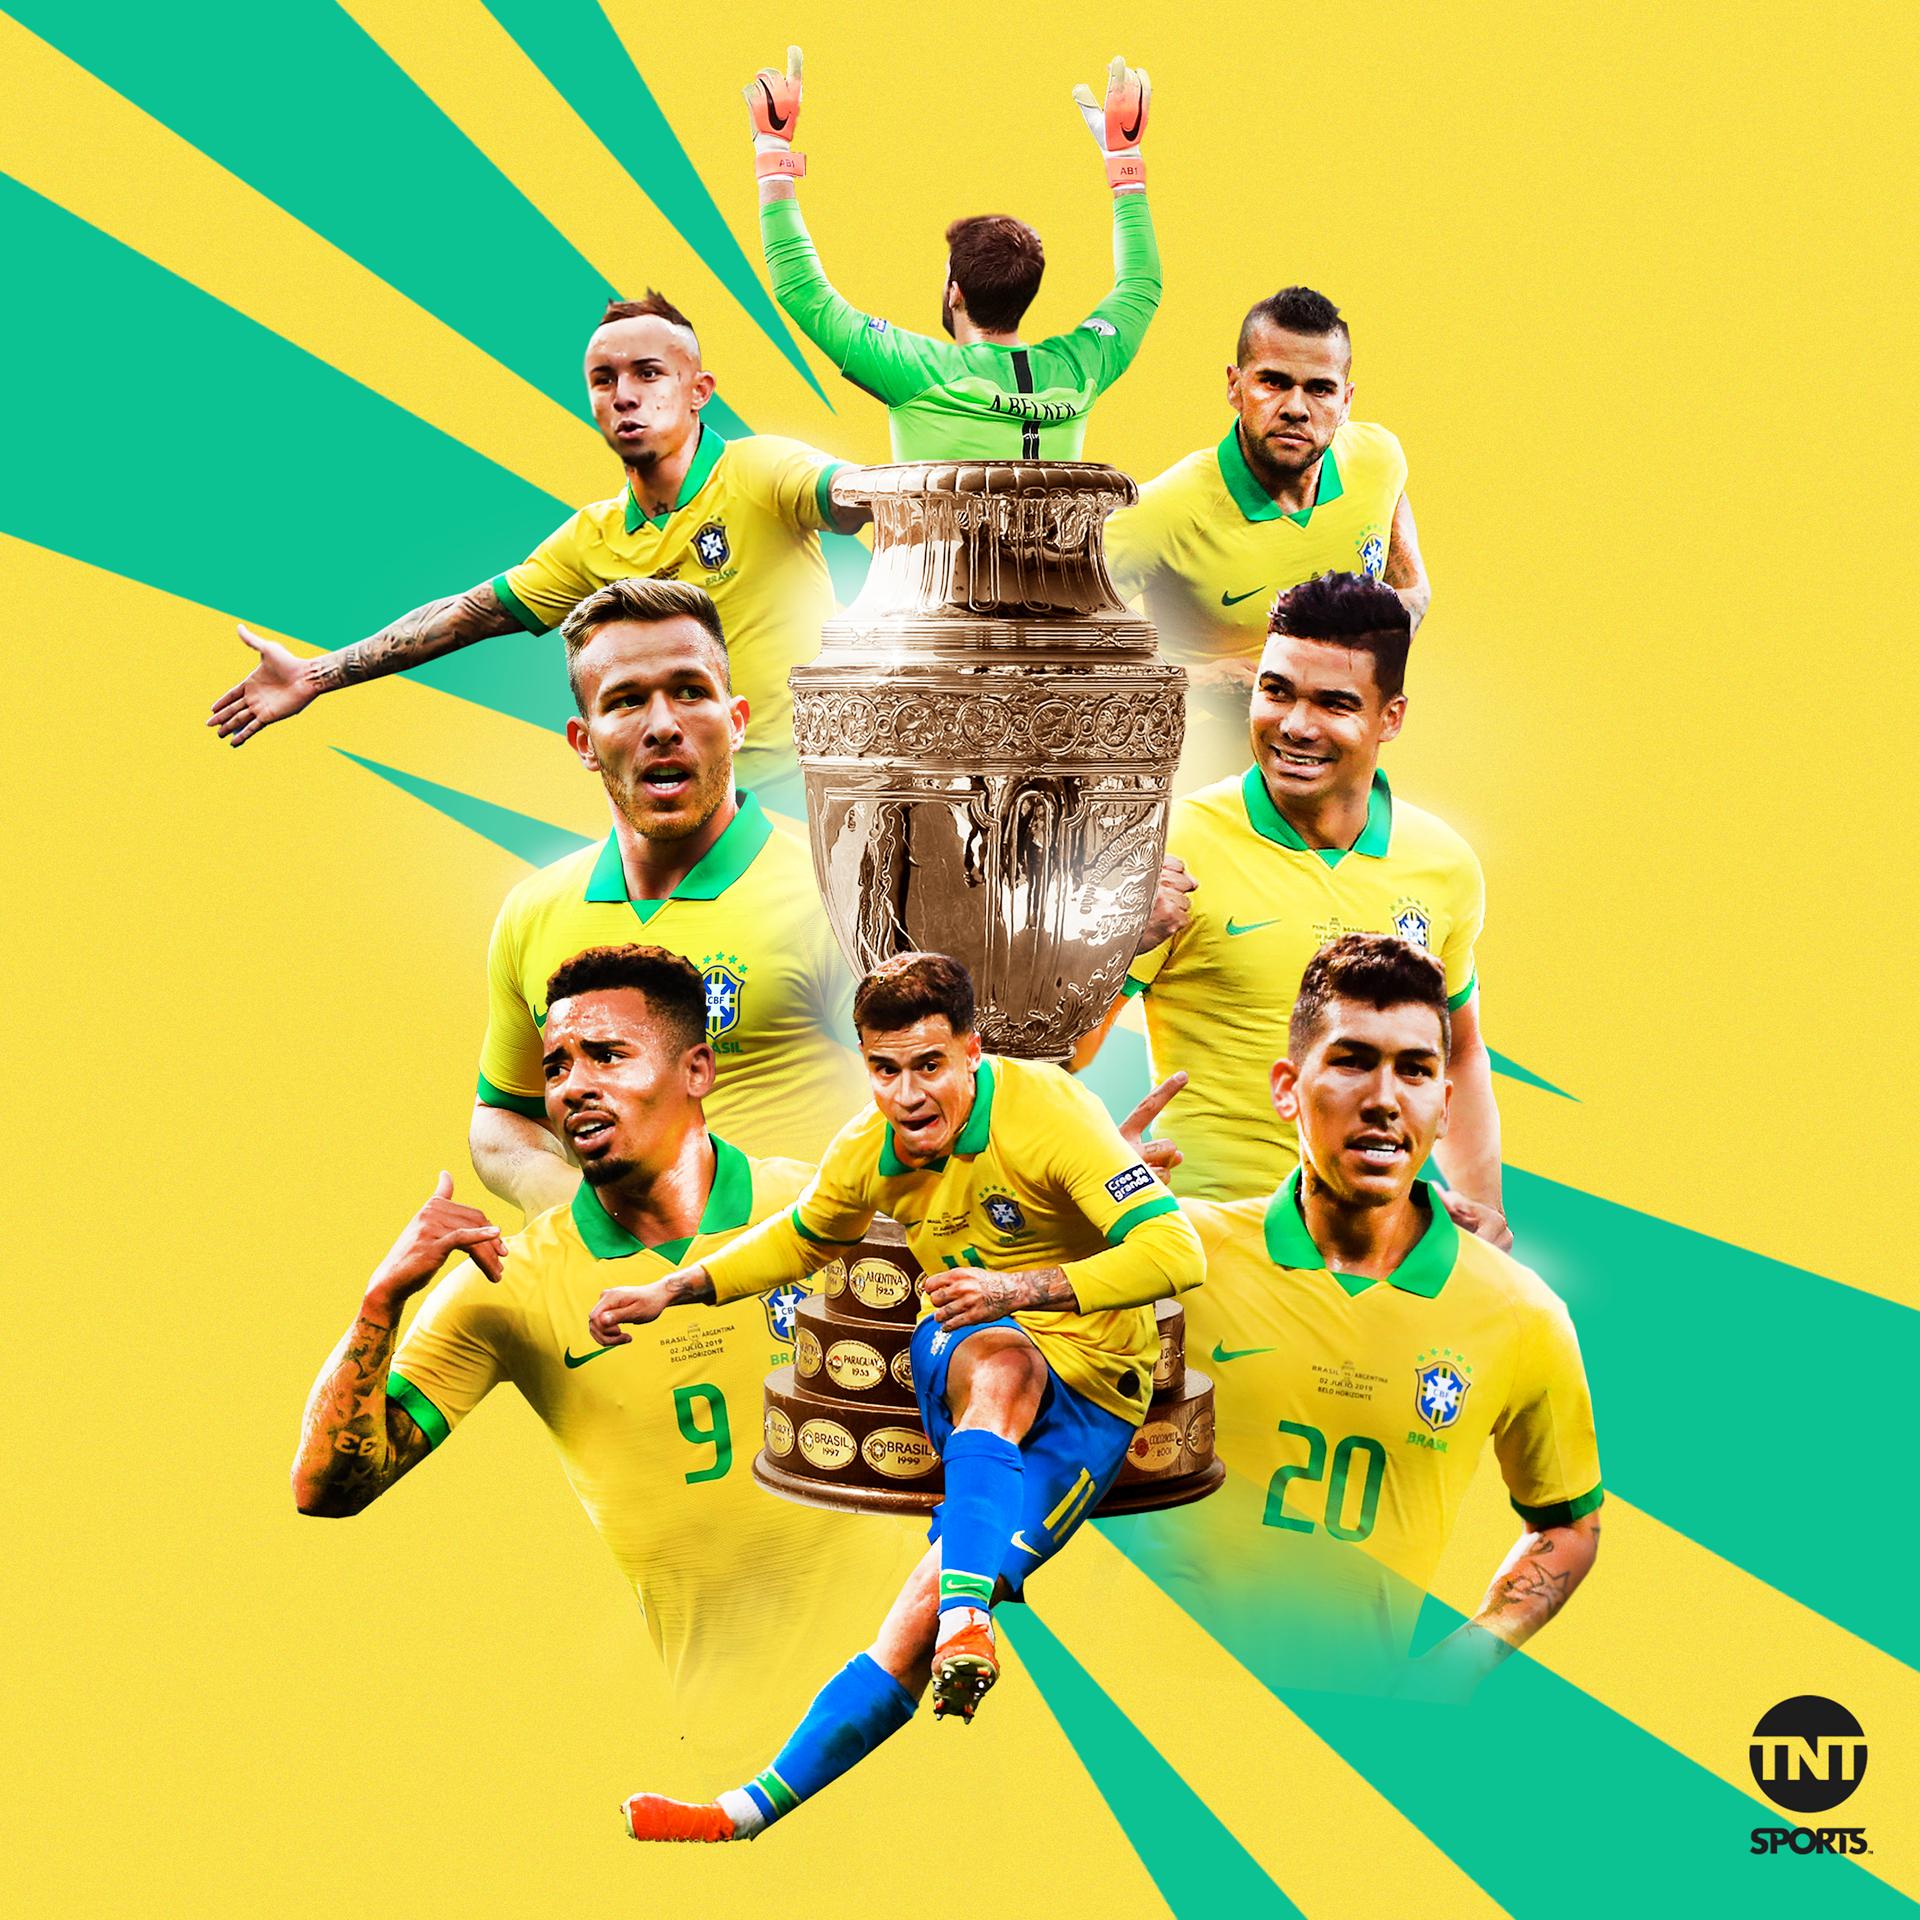 BRASIL-COLLAGE-TNT